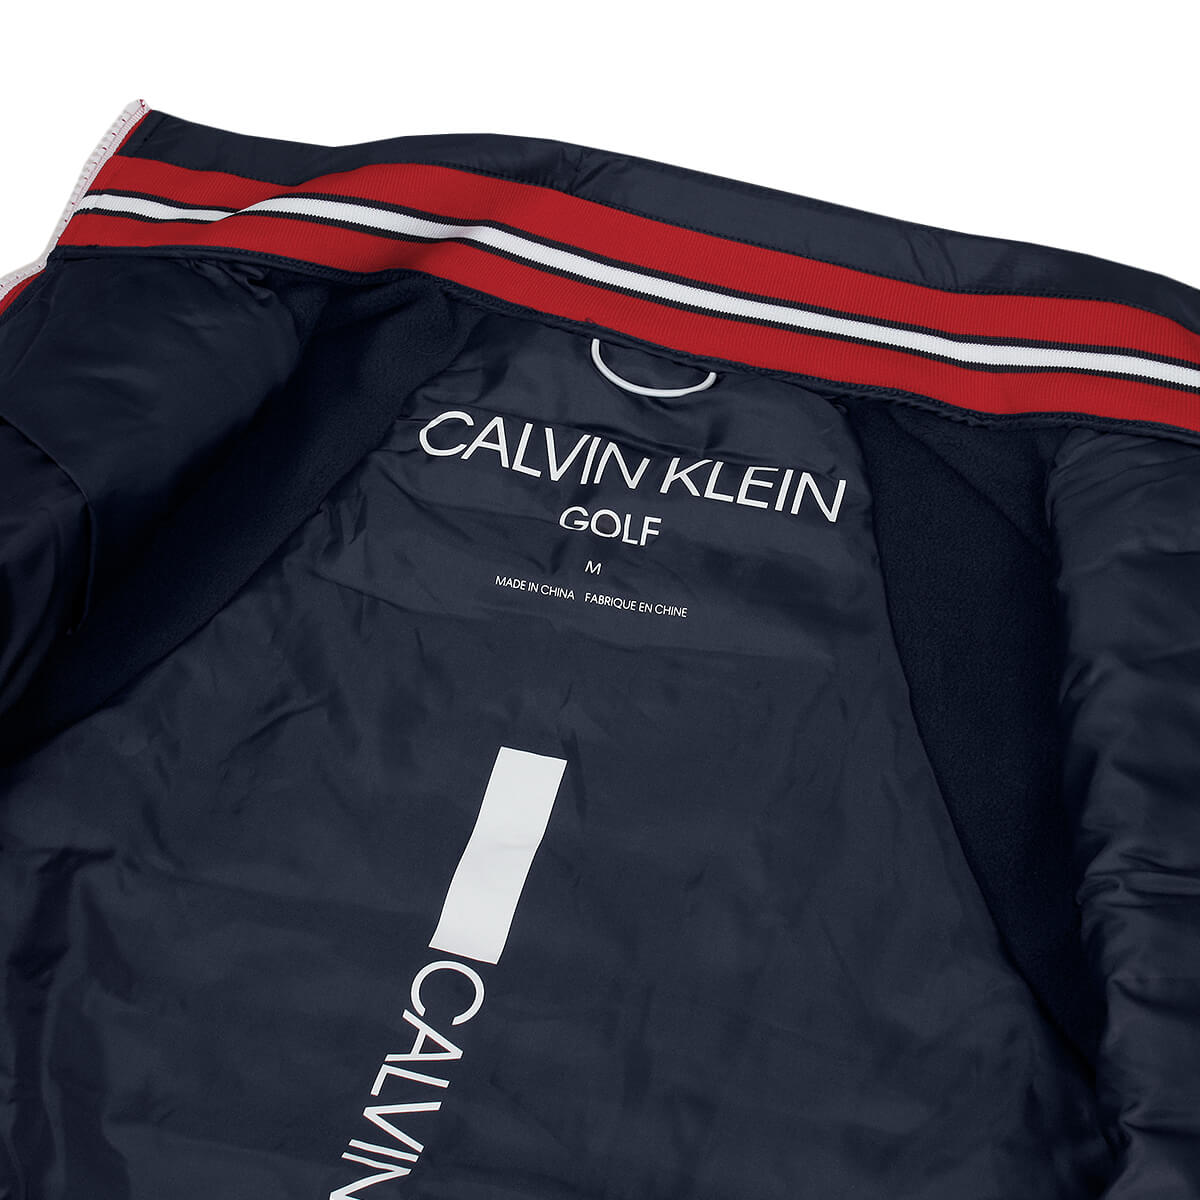 Calvin-Klein-Mens-2020-Hybrid-Insulate-Lightweight-Bodywarmer-Gilet-31-OFF-RRP thumbnail 10